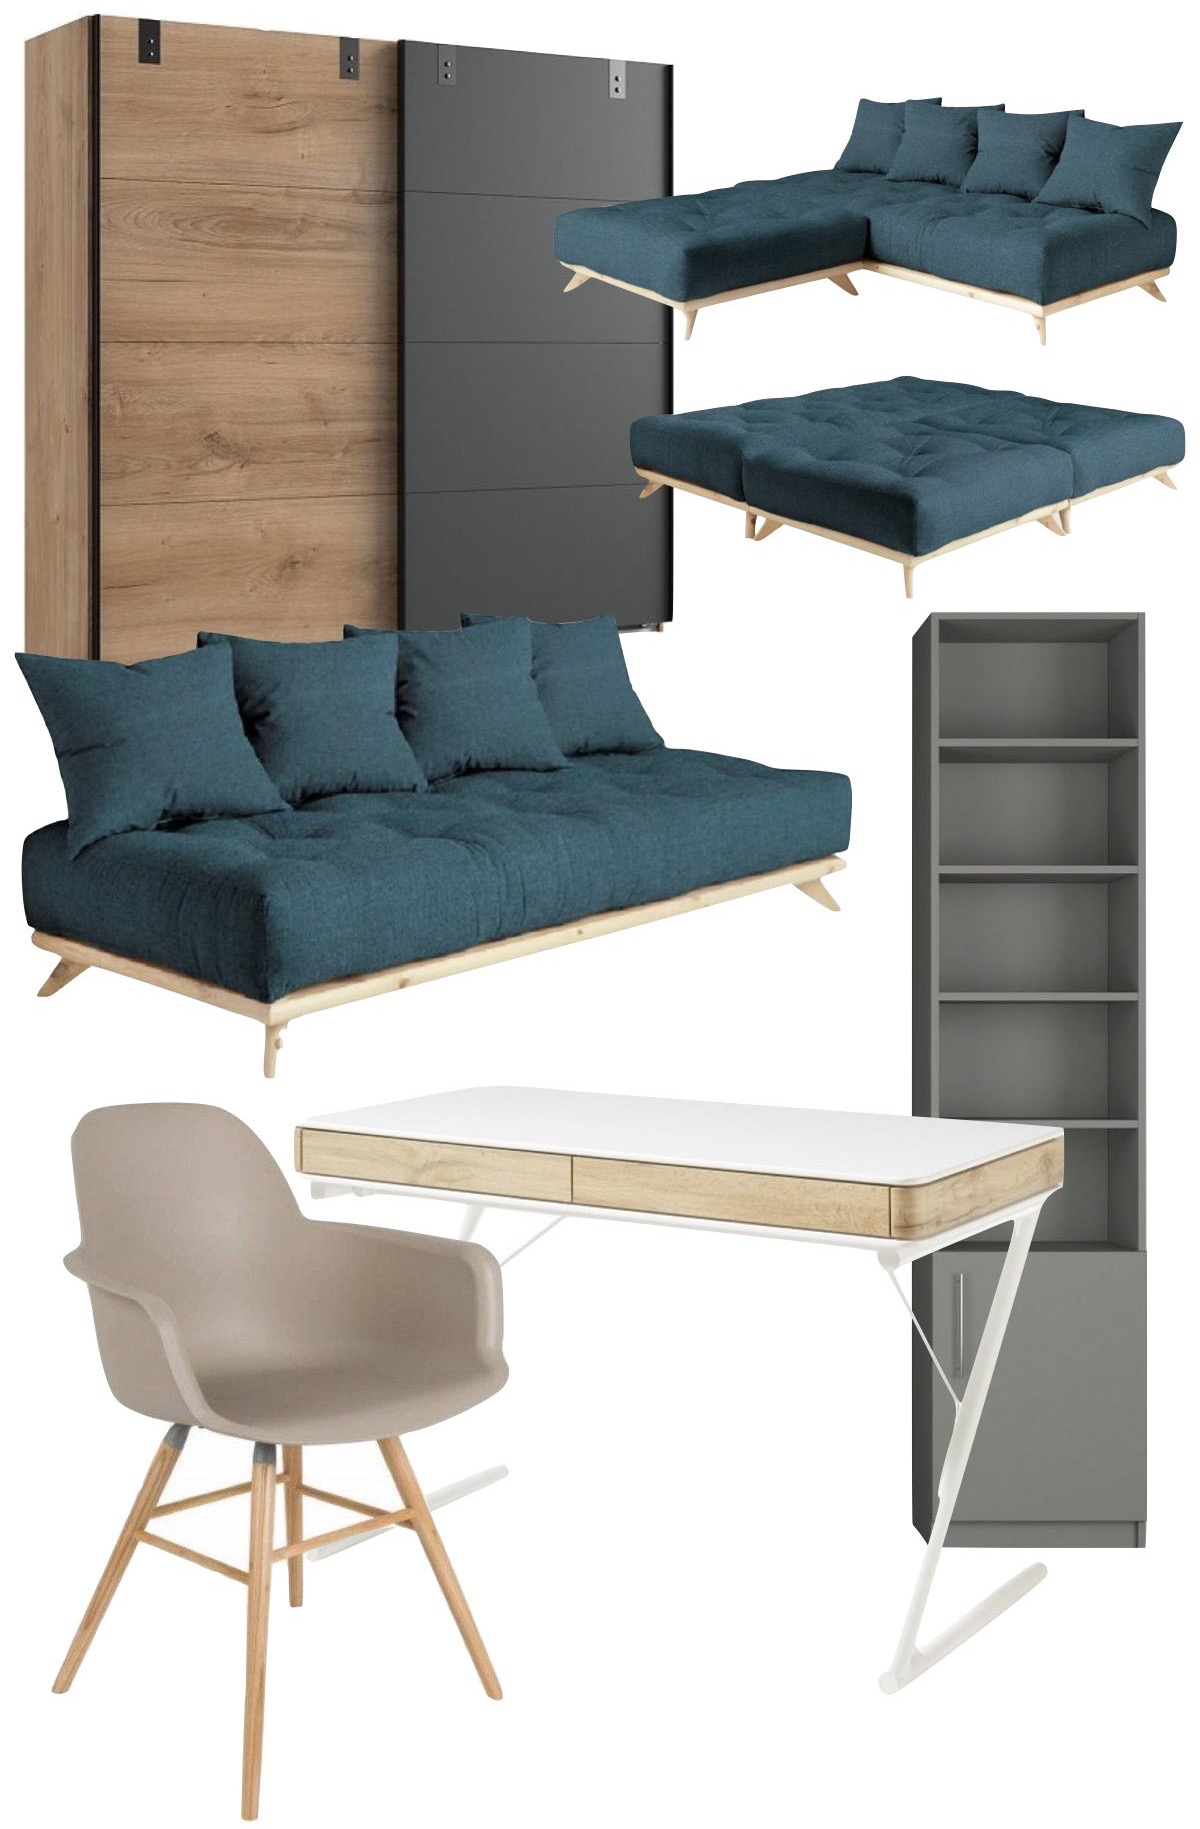 soldes 2020 inside75 canapé convertible chambre ado moderne scandinave grise bois bleu design